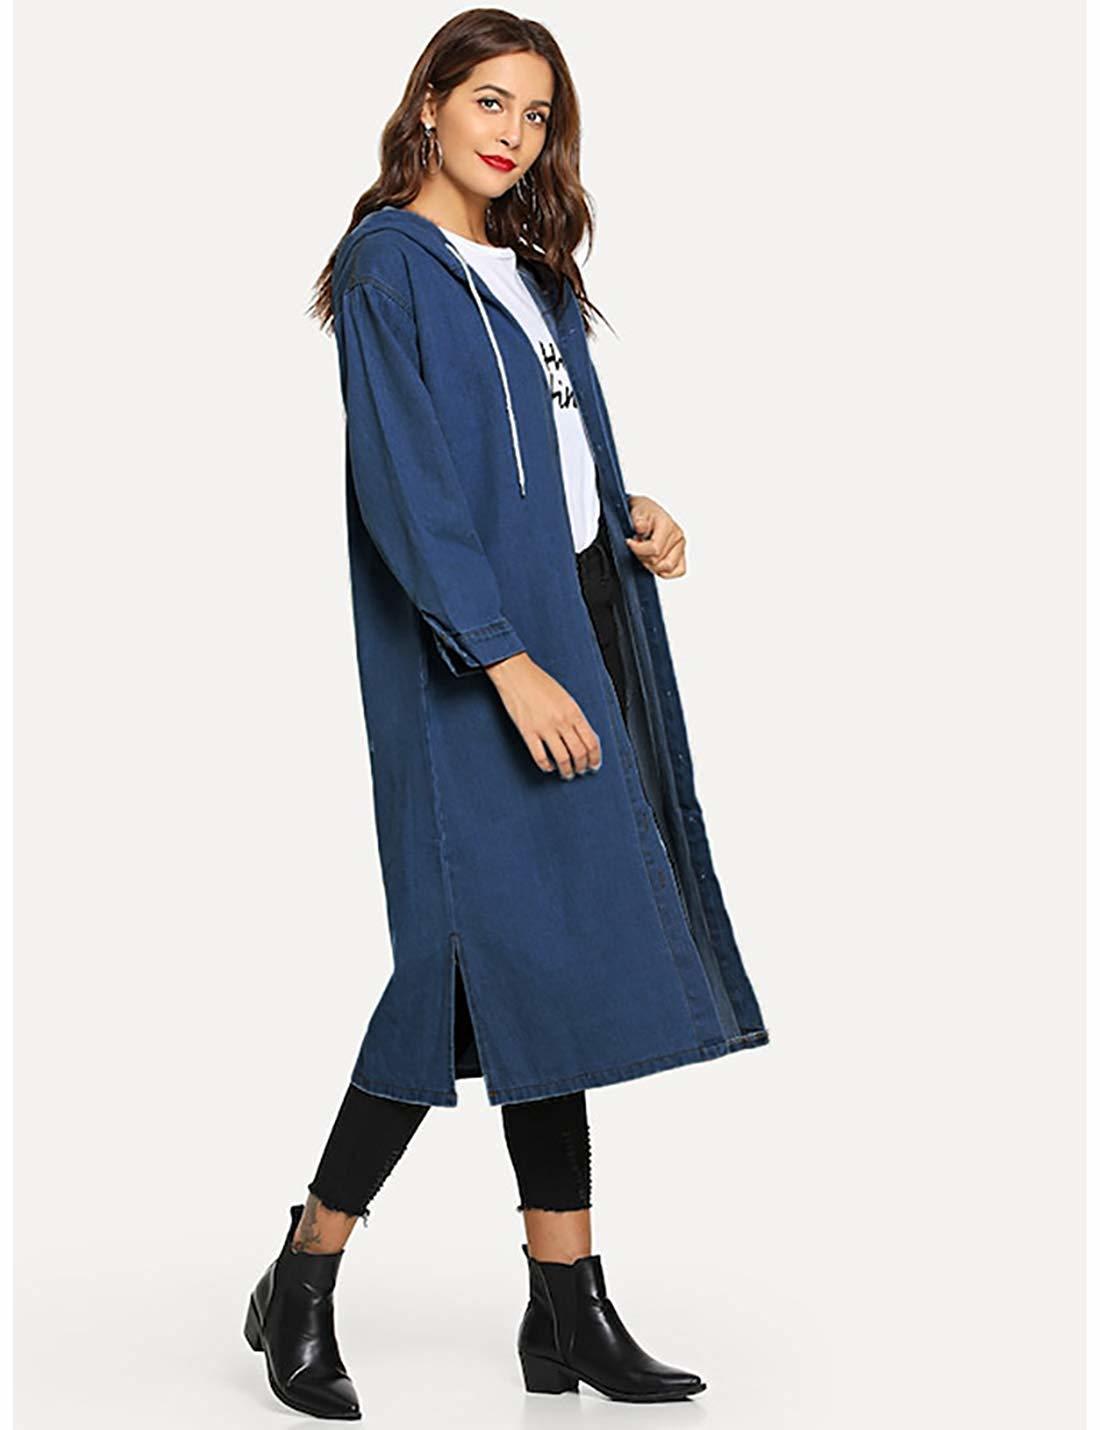 Yeokou Women's Distressed Autumn Loose Baggy Long Denim Jean Trucker Shirt Jacket Y200101